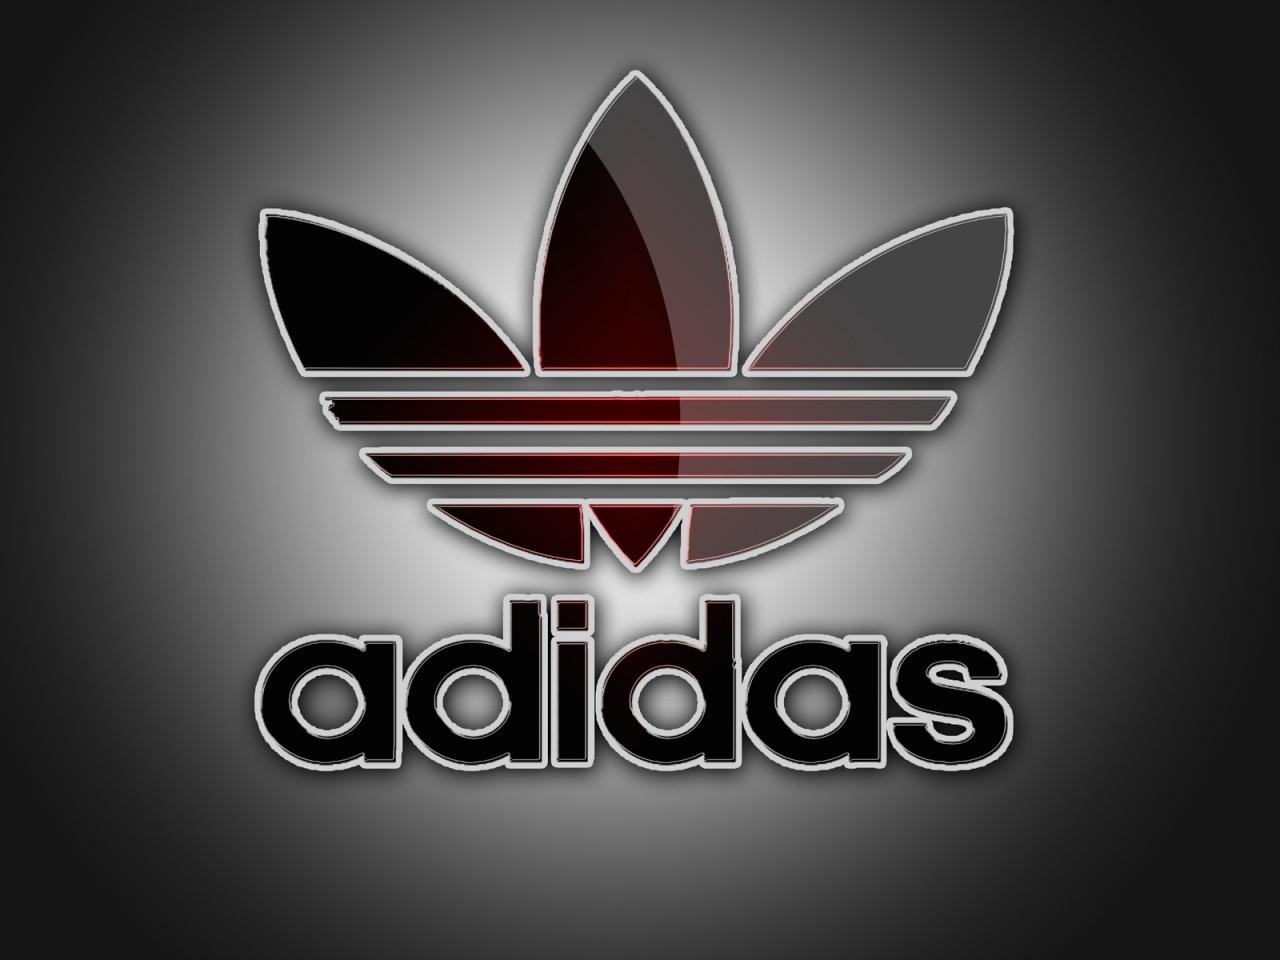 Cool Nike Logos 56 Wallpaper Pictures to pin 1280x960